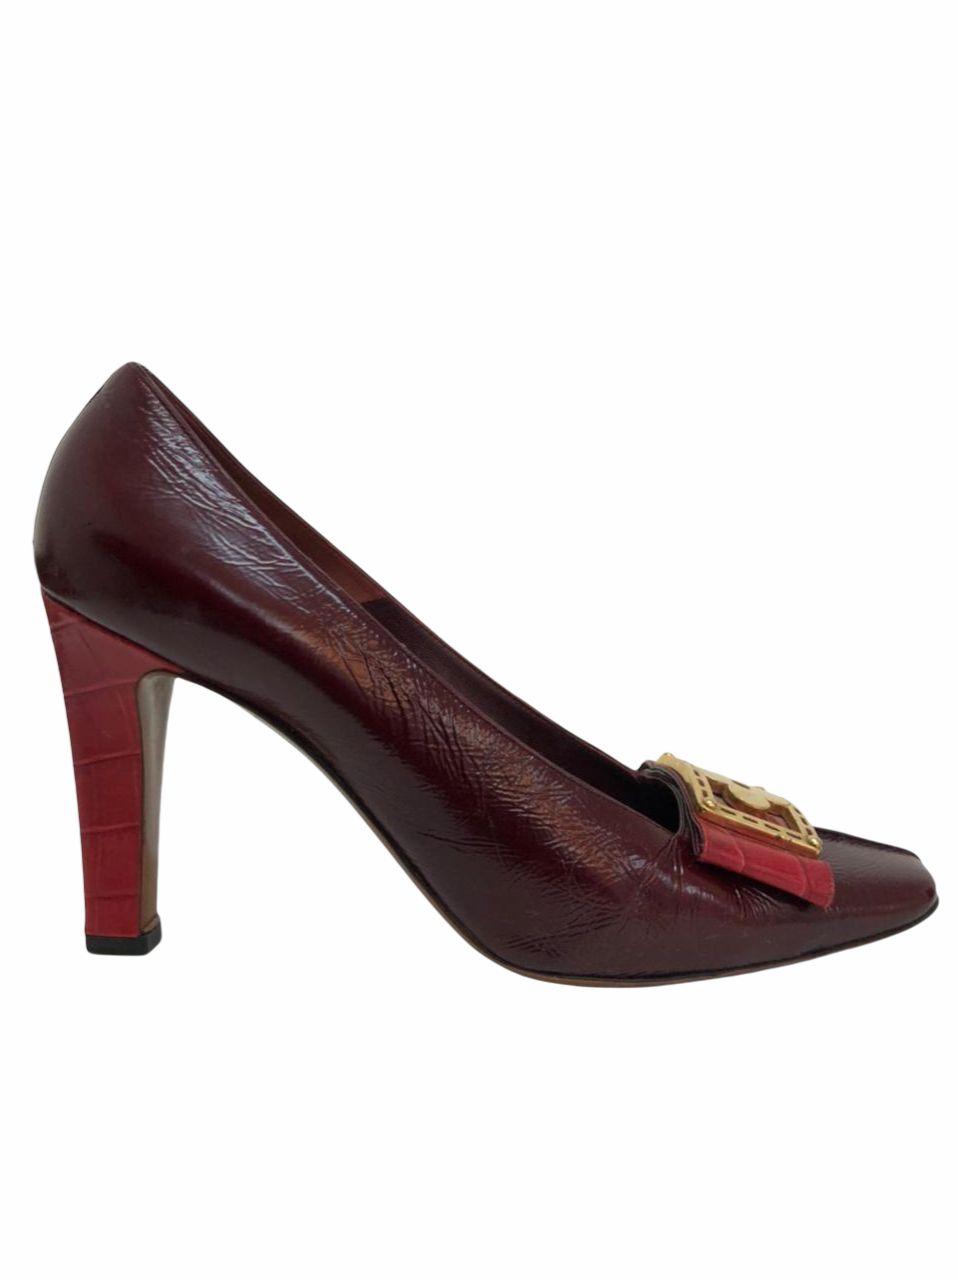 Sapato Louis Vuitton Vinho